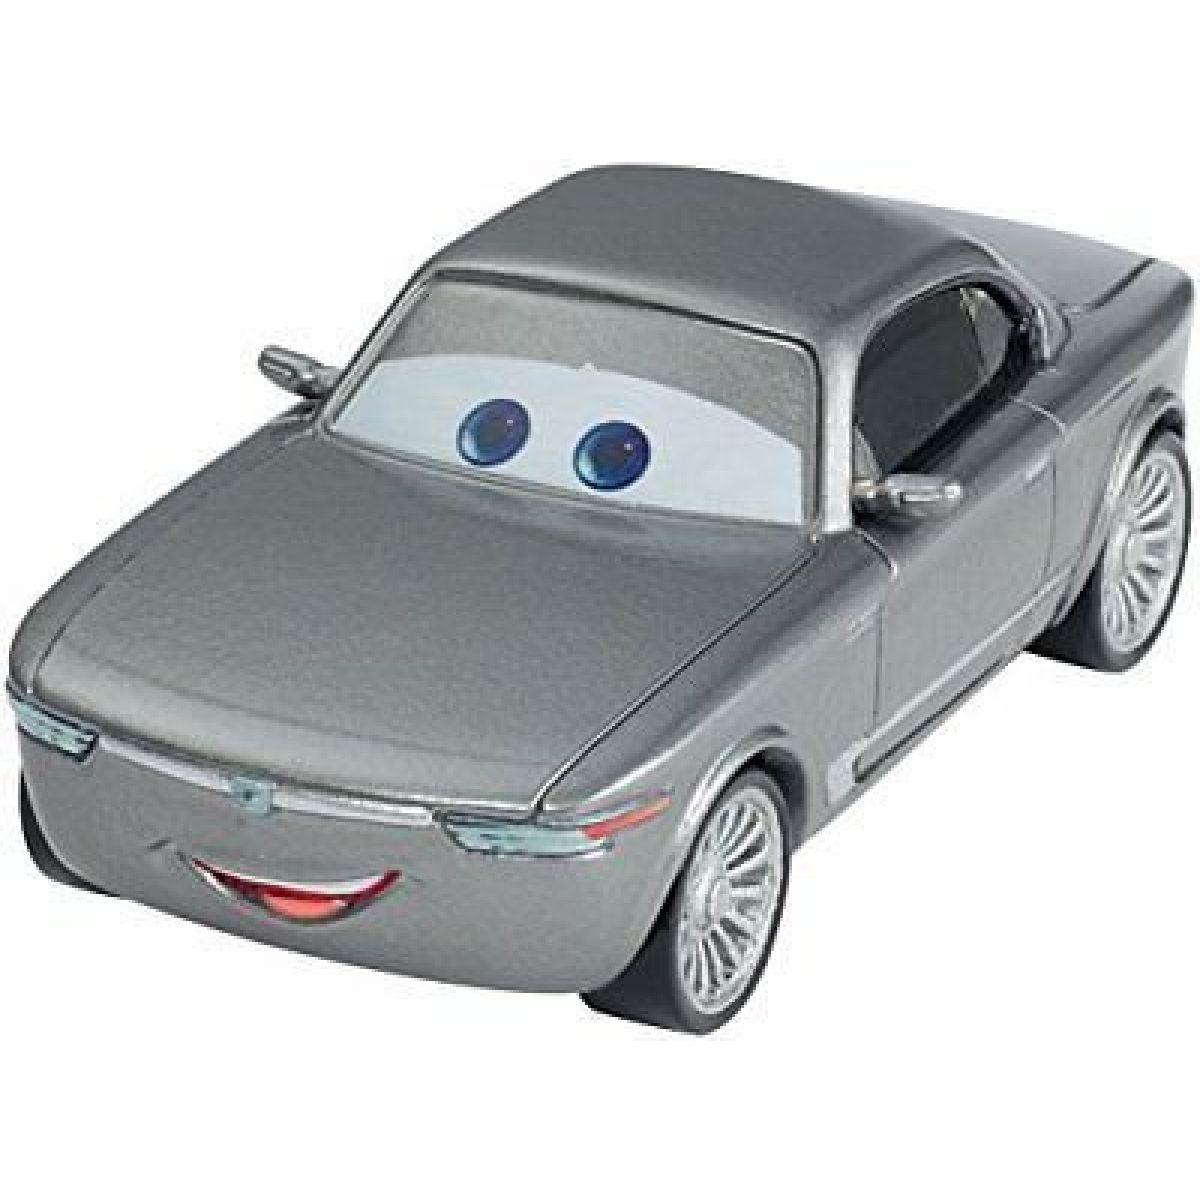 Mattel Cars 3 Auta Sterling